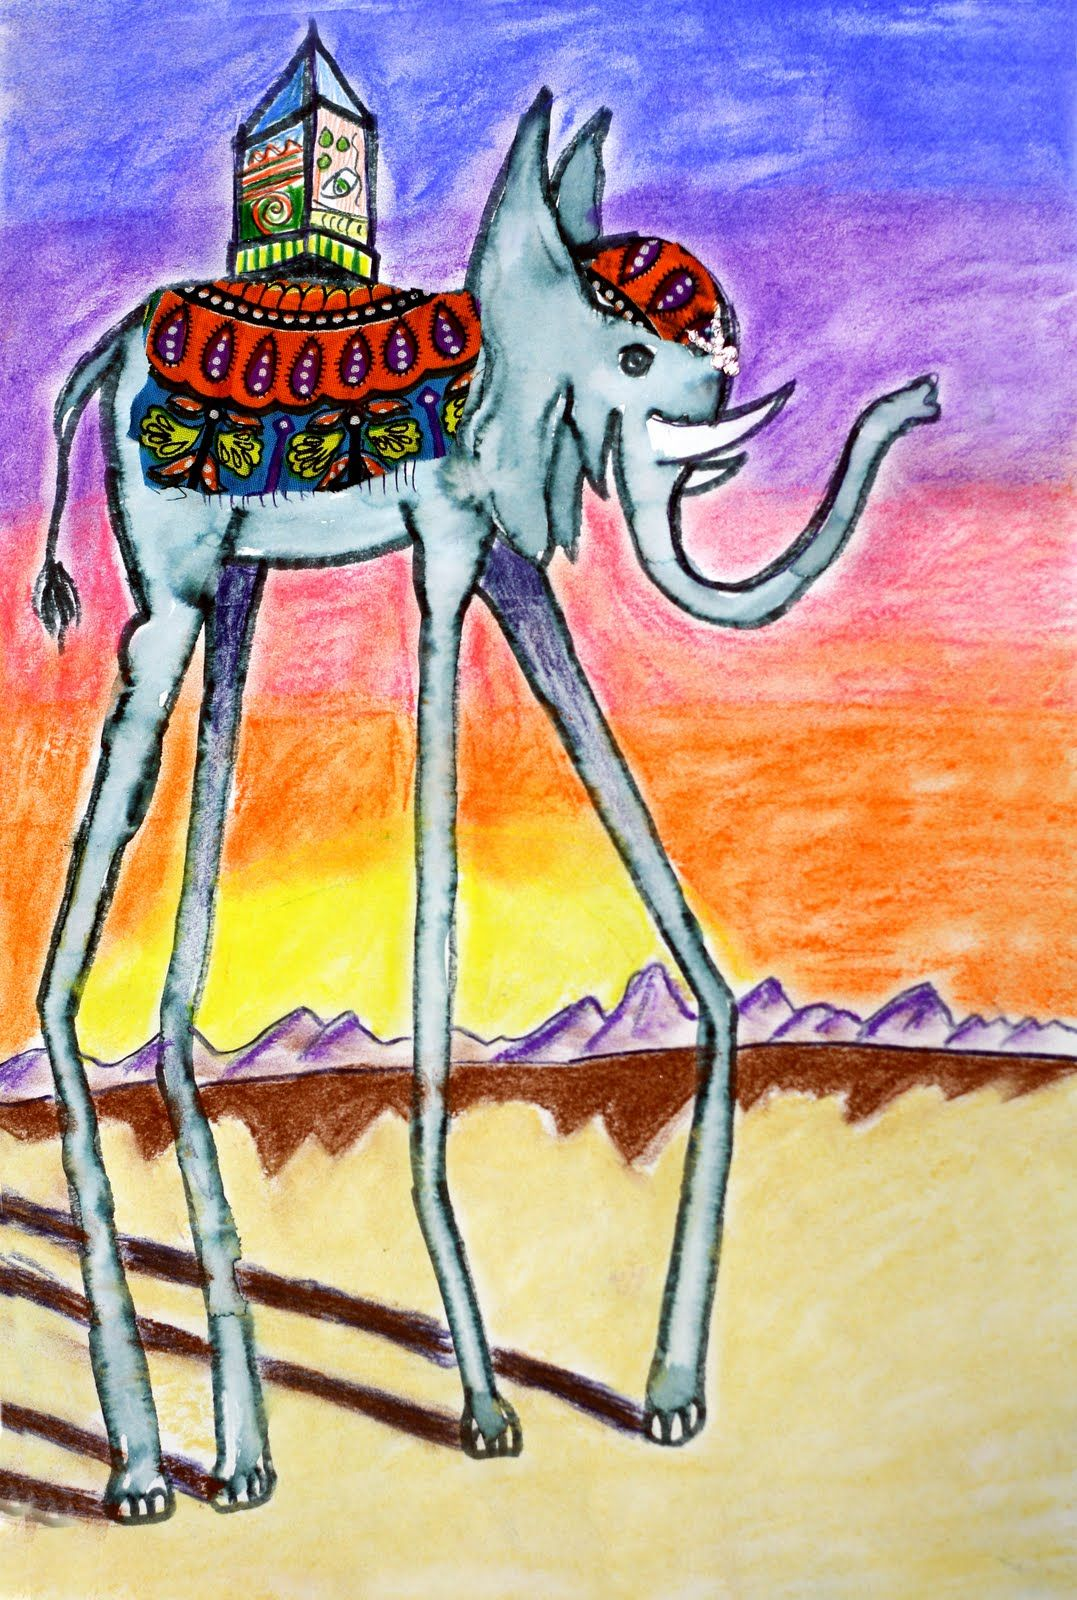 9969562e8bd Surrealism  Salvador Dali Elephants and Surrealistic Creatures